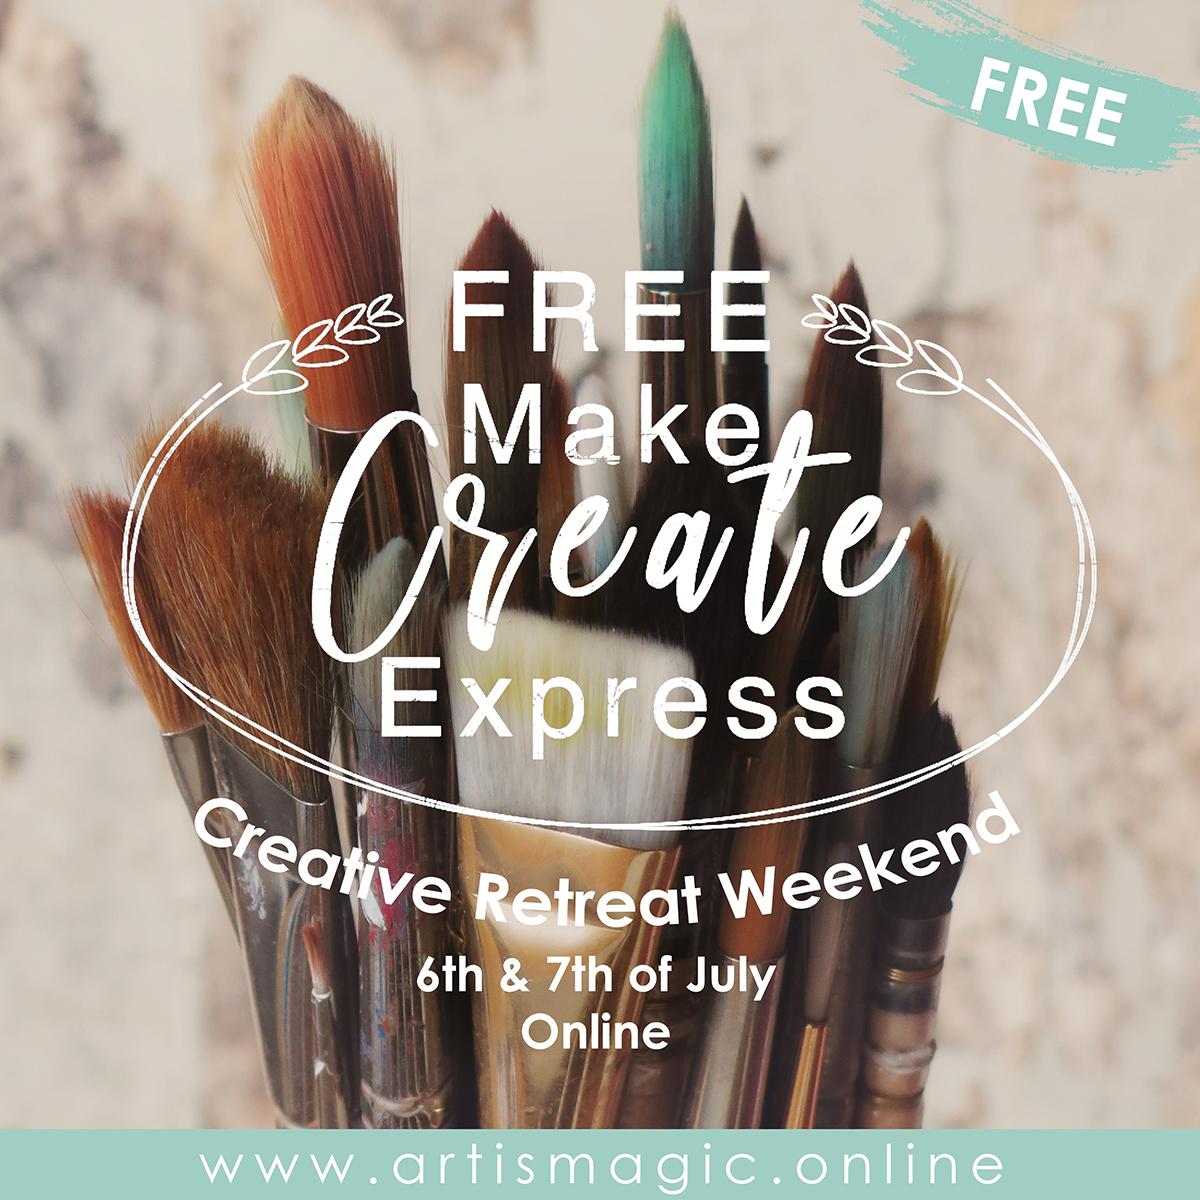 Make Create Express FREE Creative Retreat Weekend